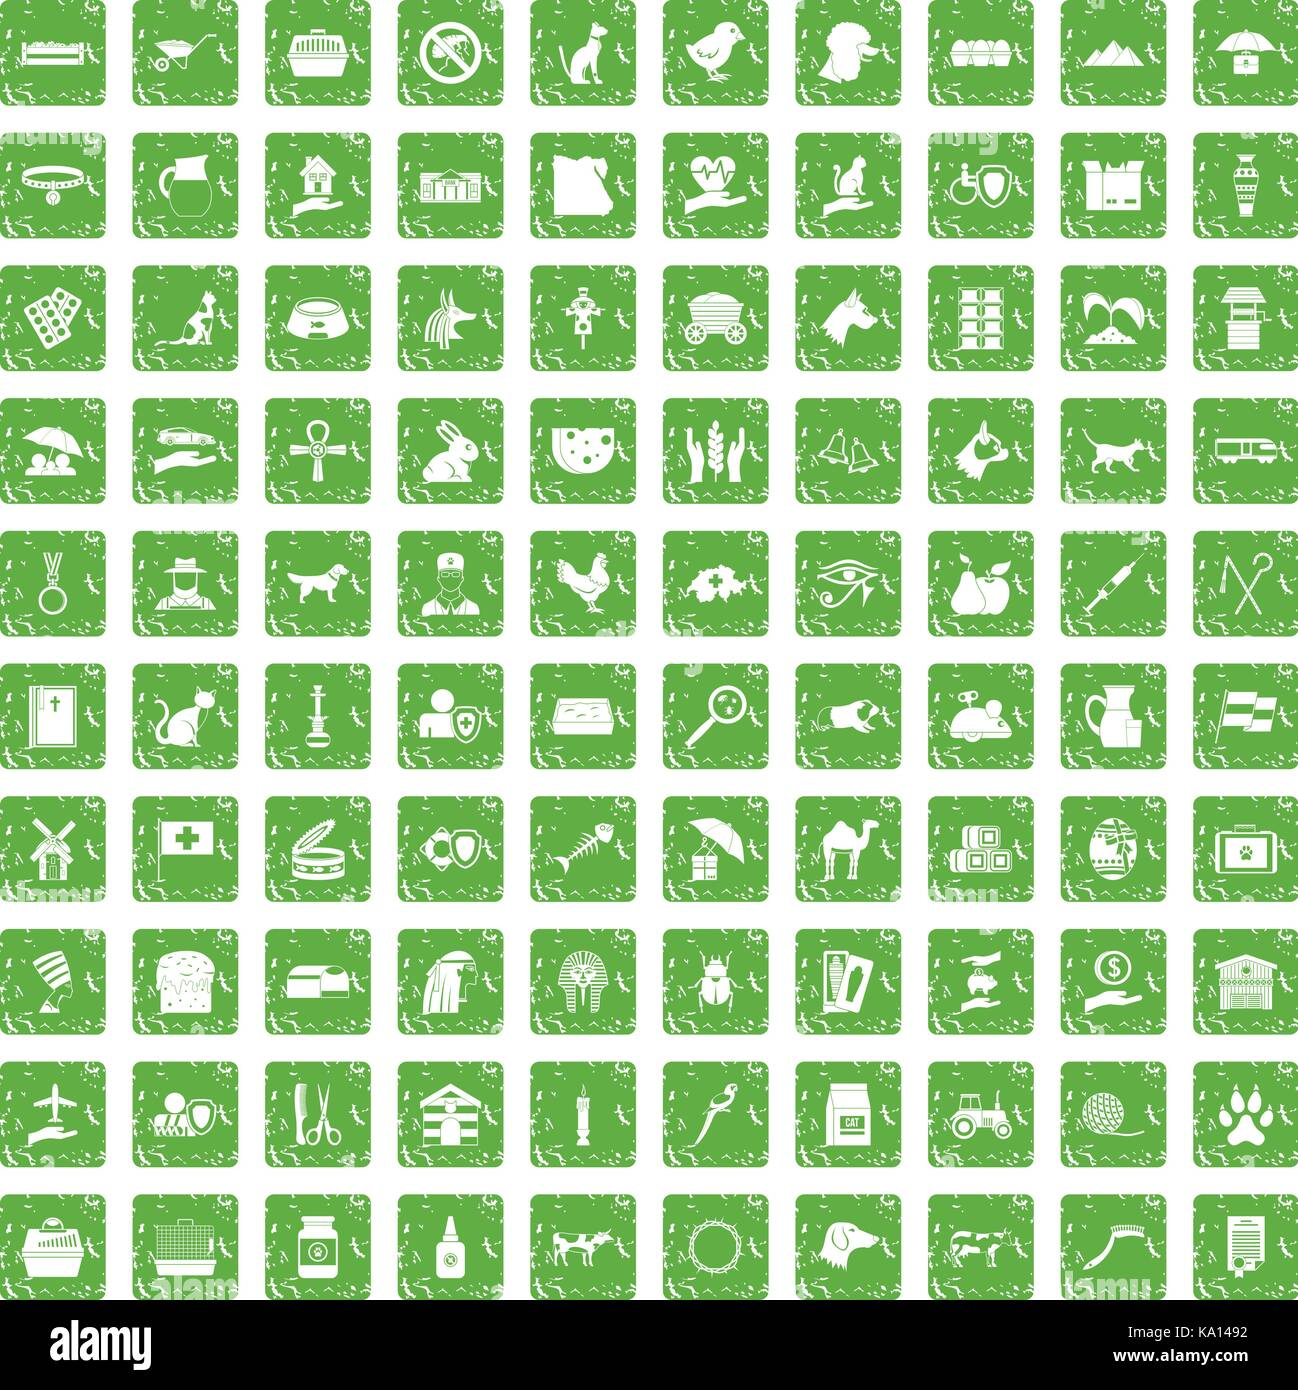 100 pets icons set grunge green - Stock Image